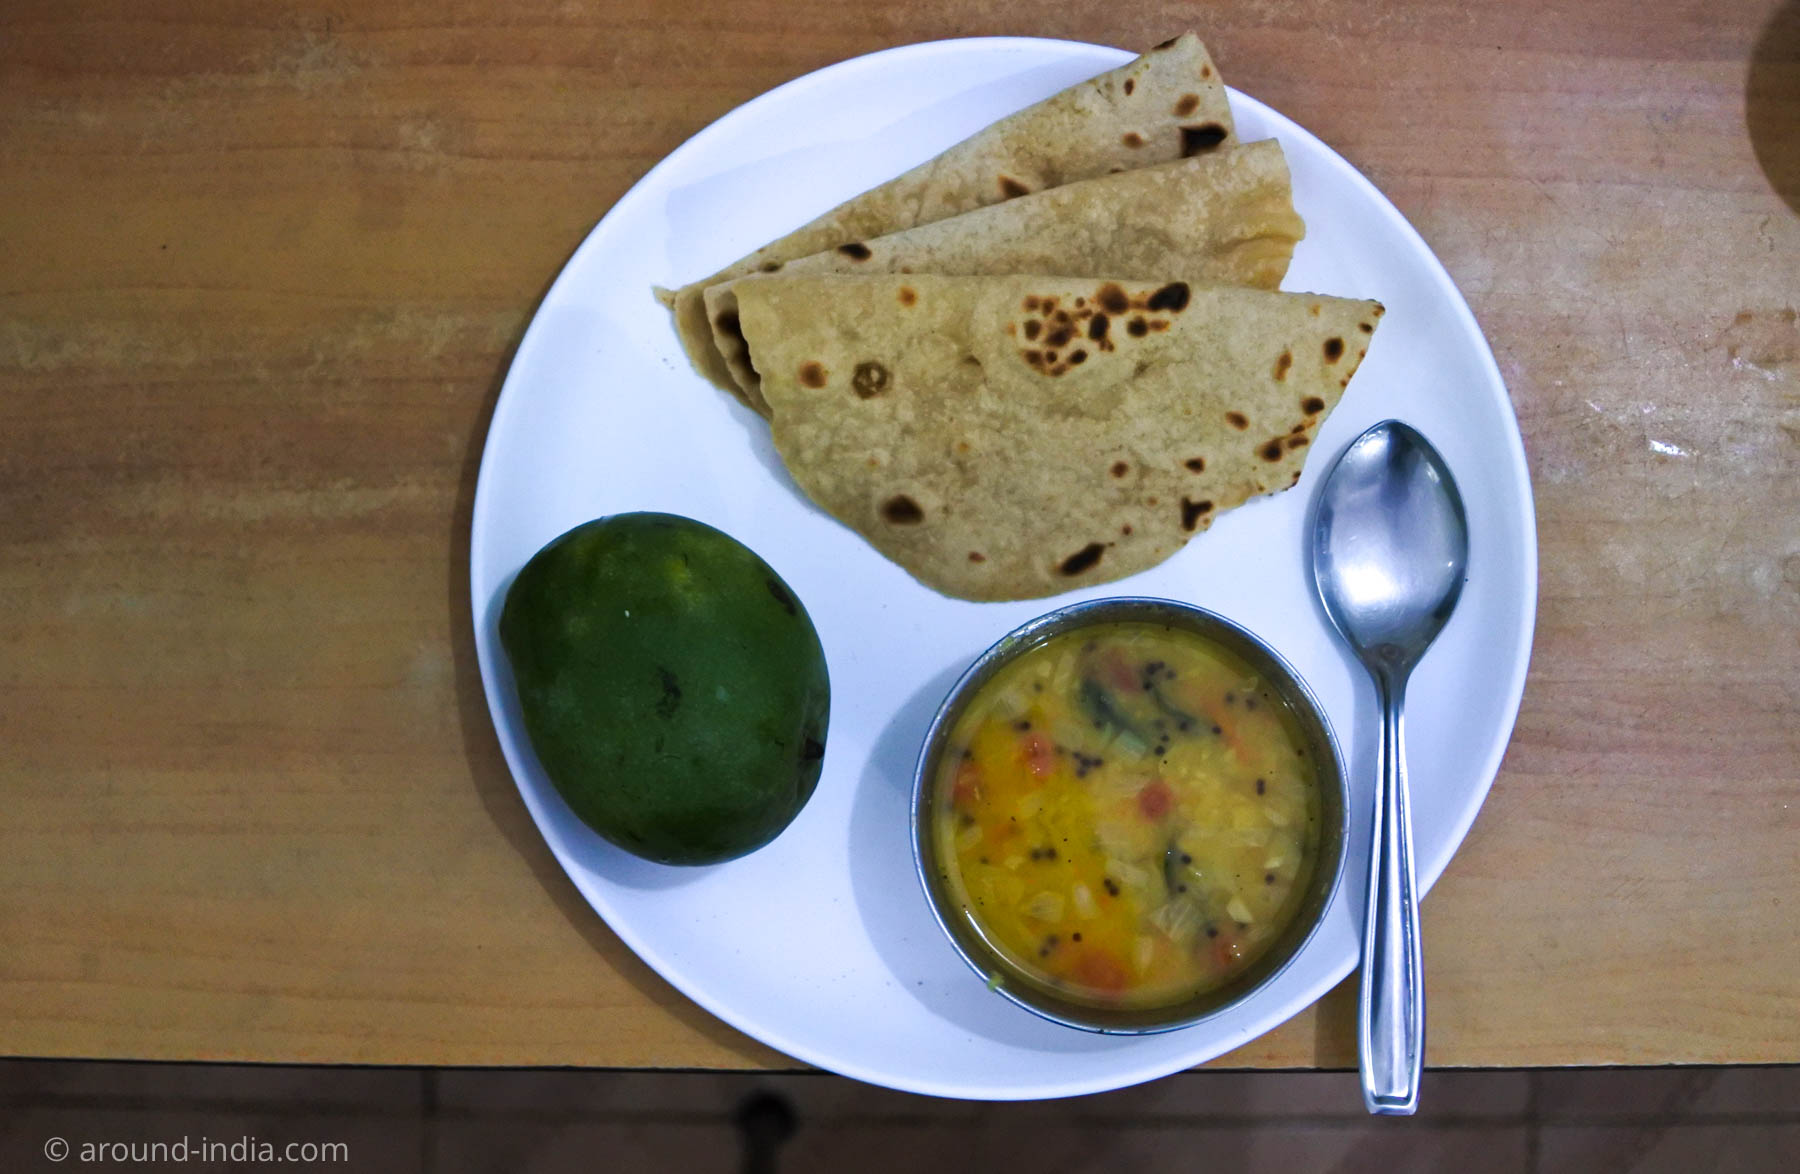 PVA ayurveda hospitalパンチャカルマ中のベジタリアン食